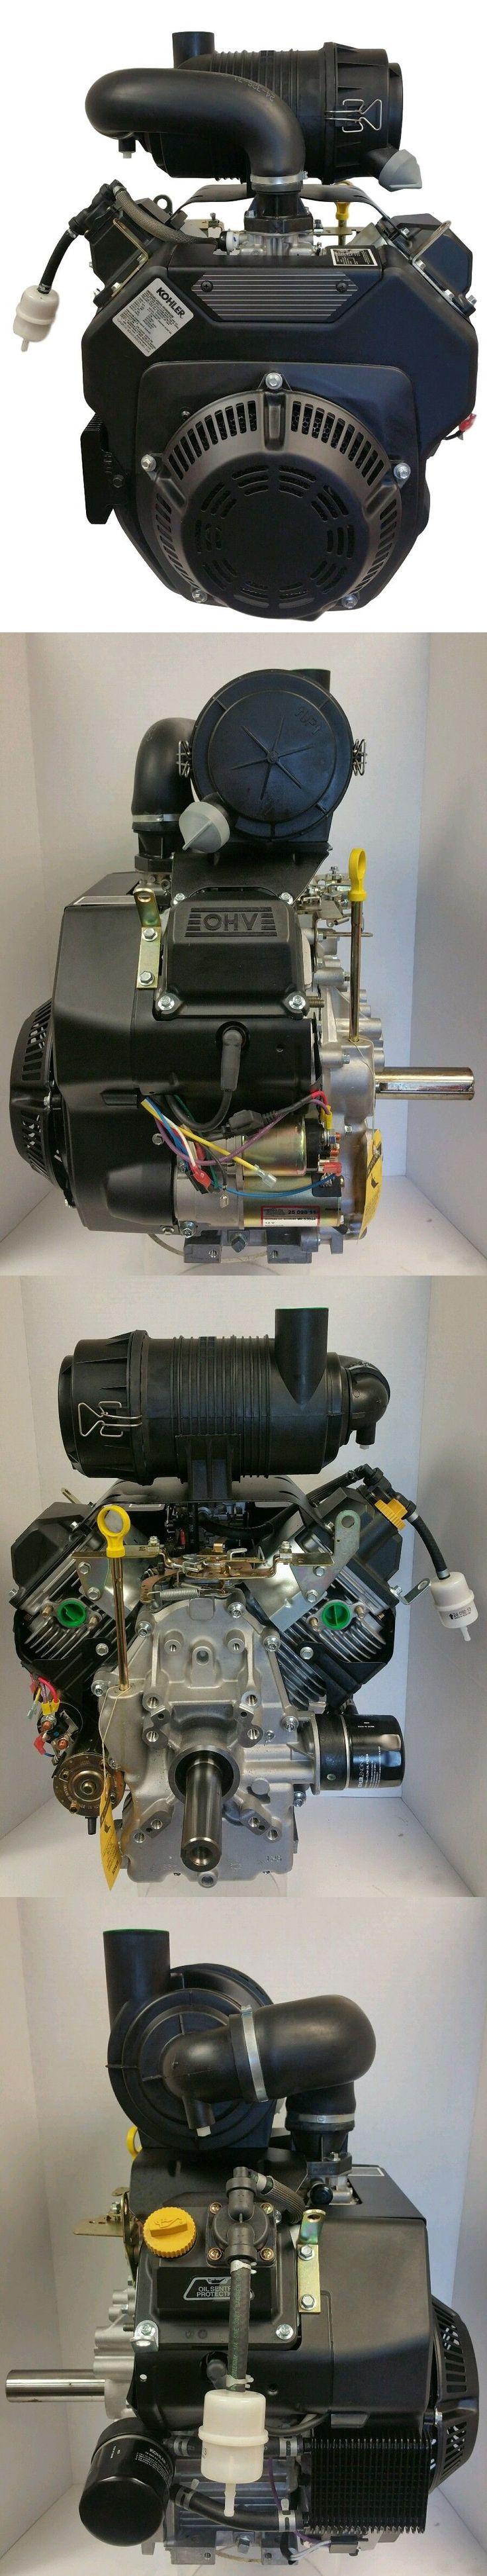 Ch25s Kohler Engine Wiring Harness Gandul 457779119 – Kohler Ch25s Wiring-diagram